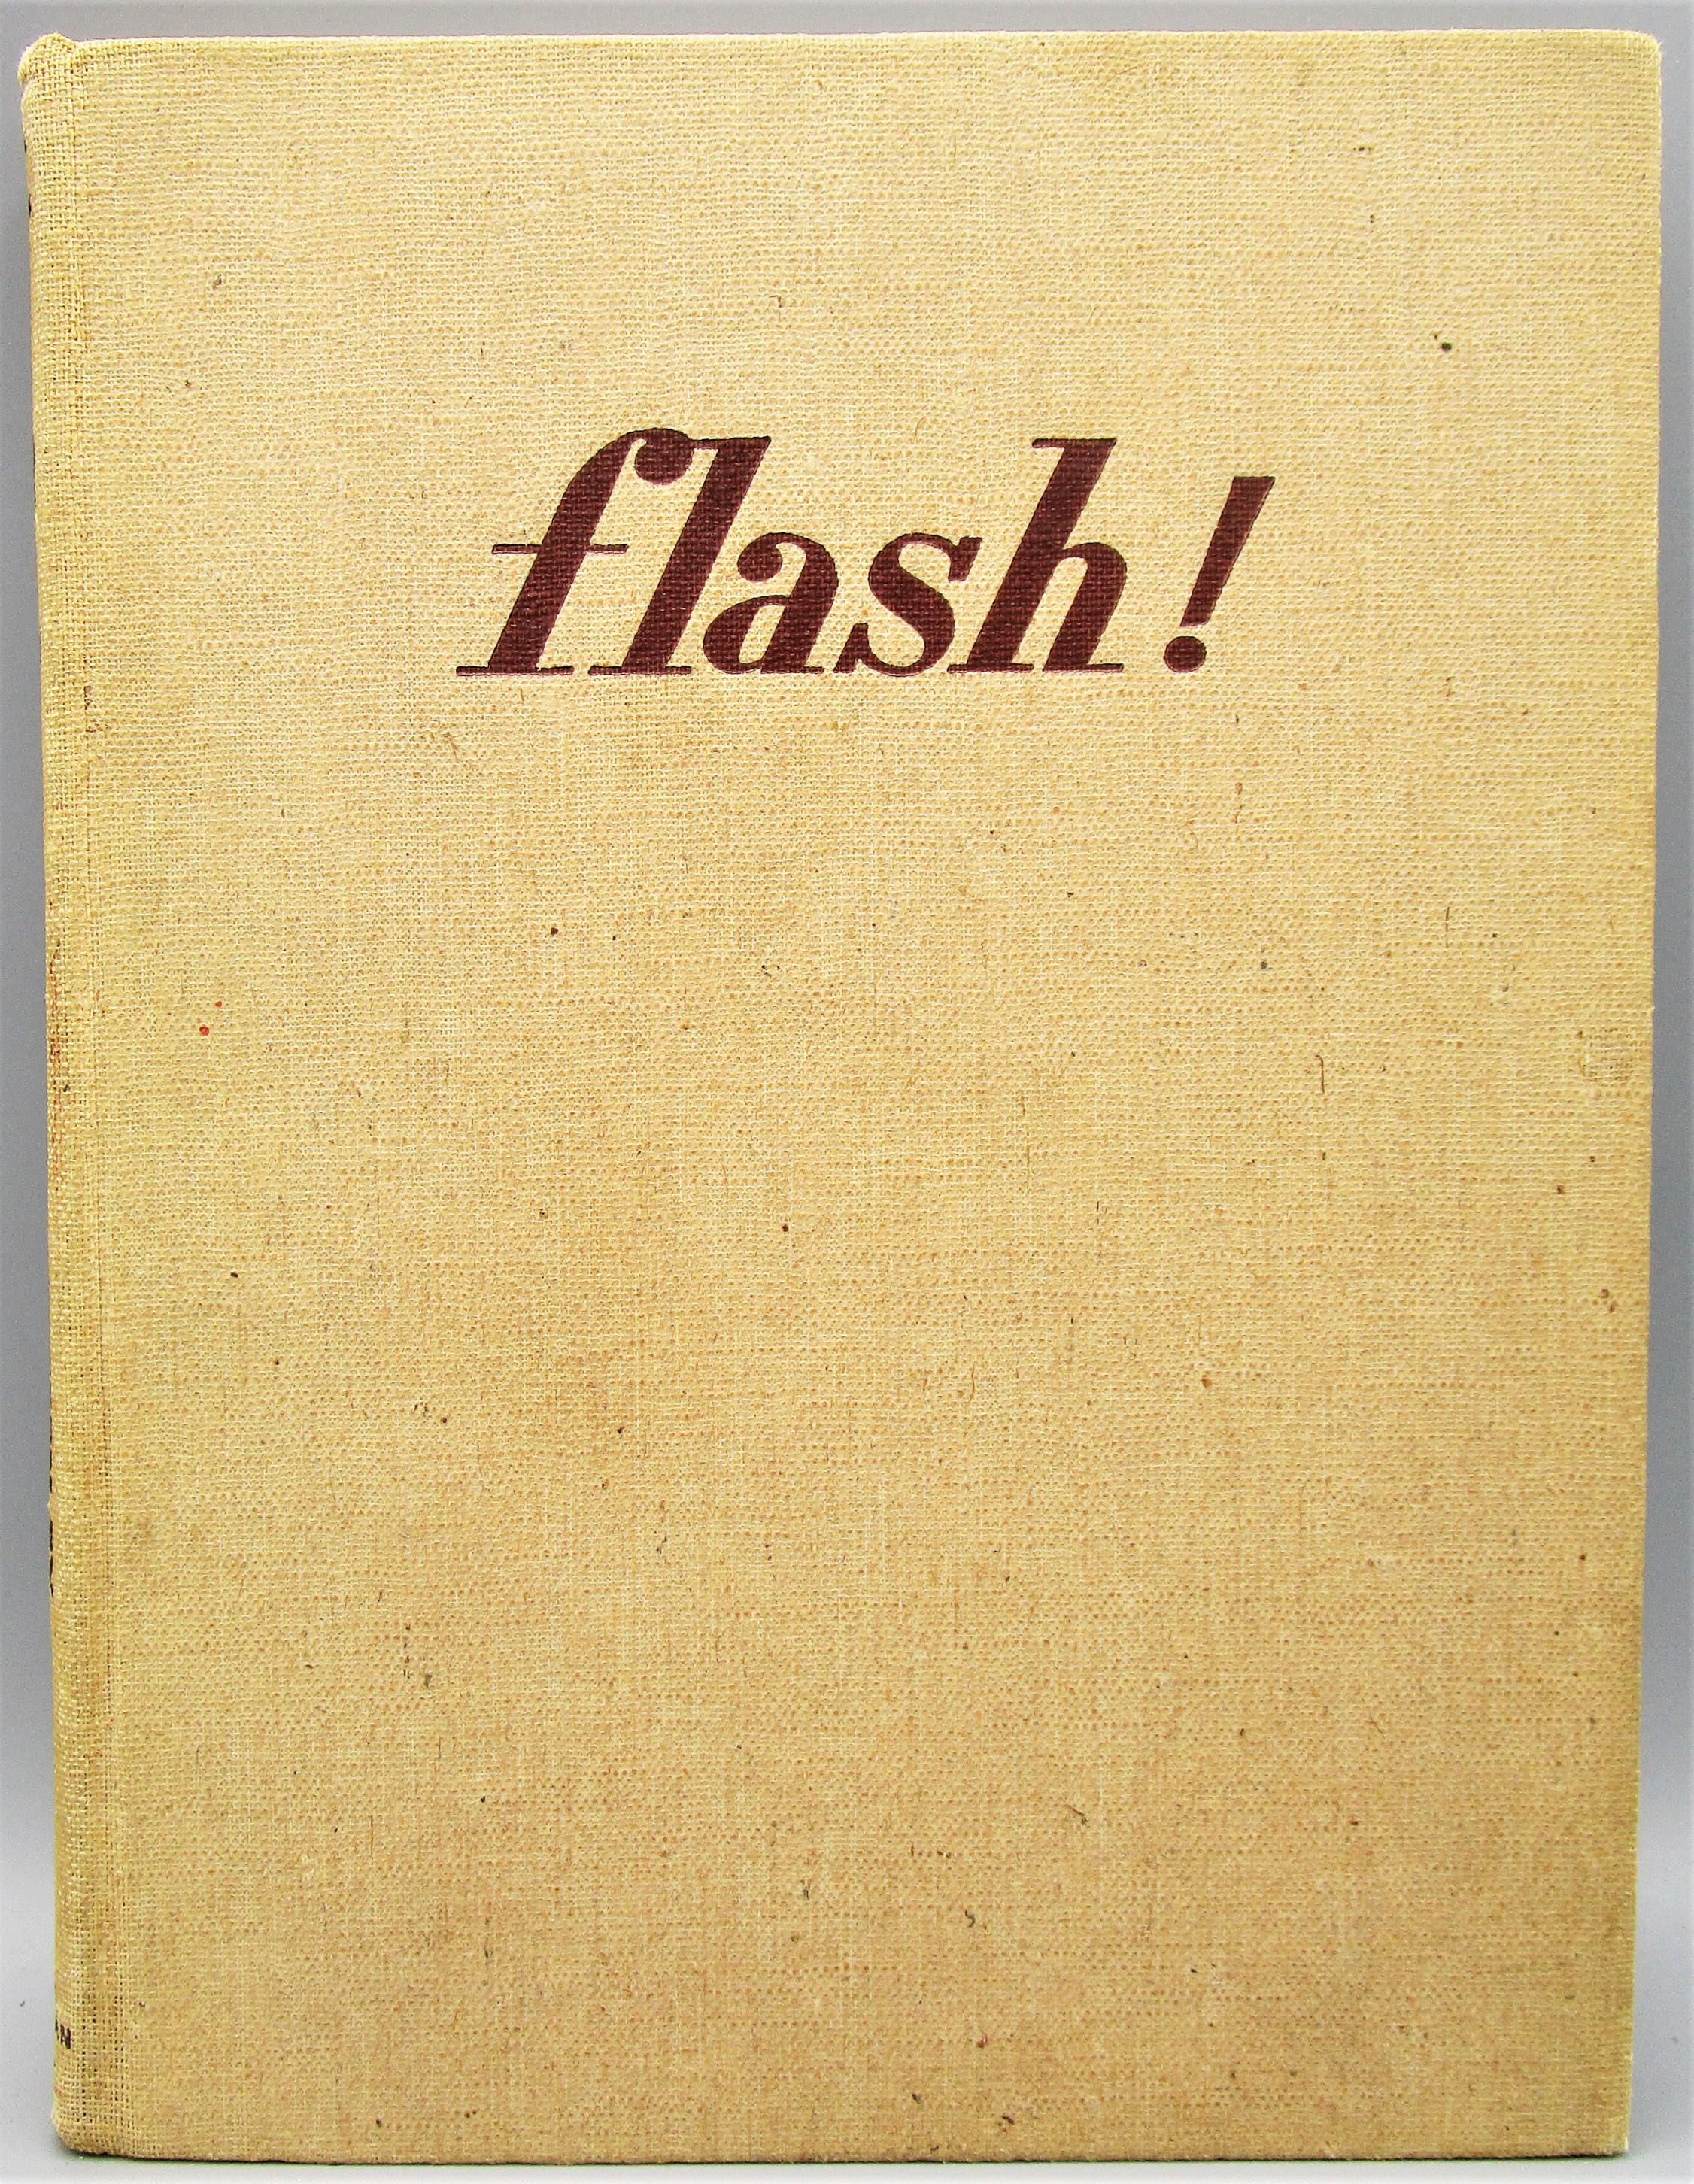 FLASH!, by Harold Edgerton and James Killian - 1939 [1st Ed]